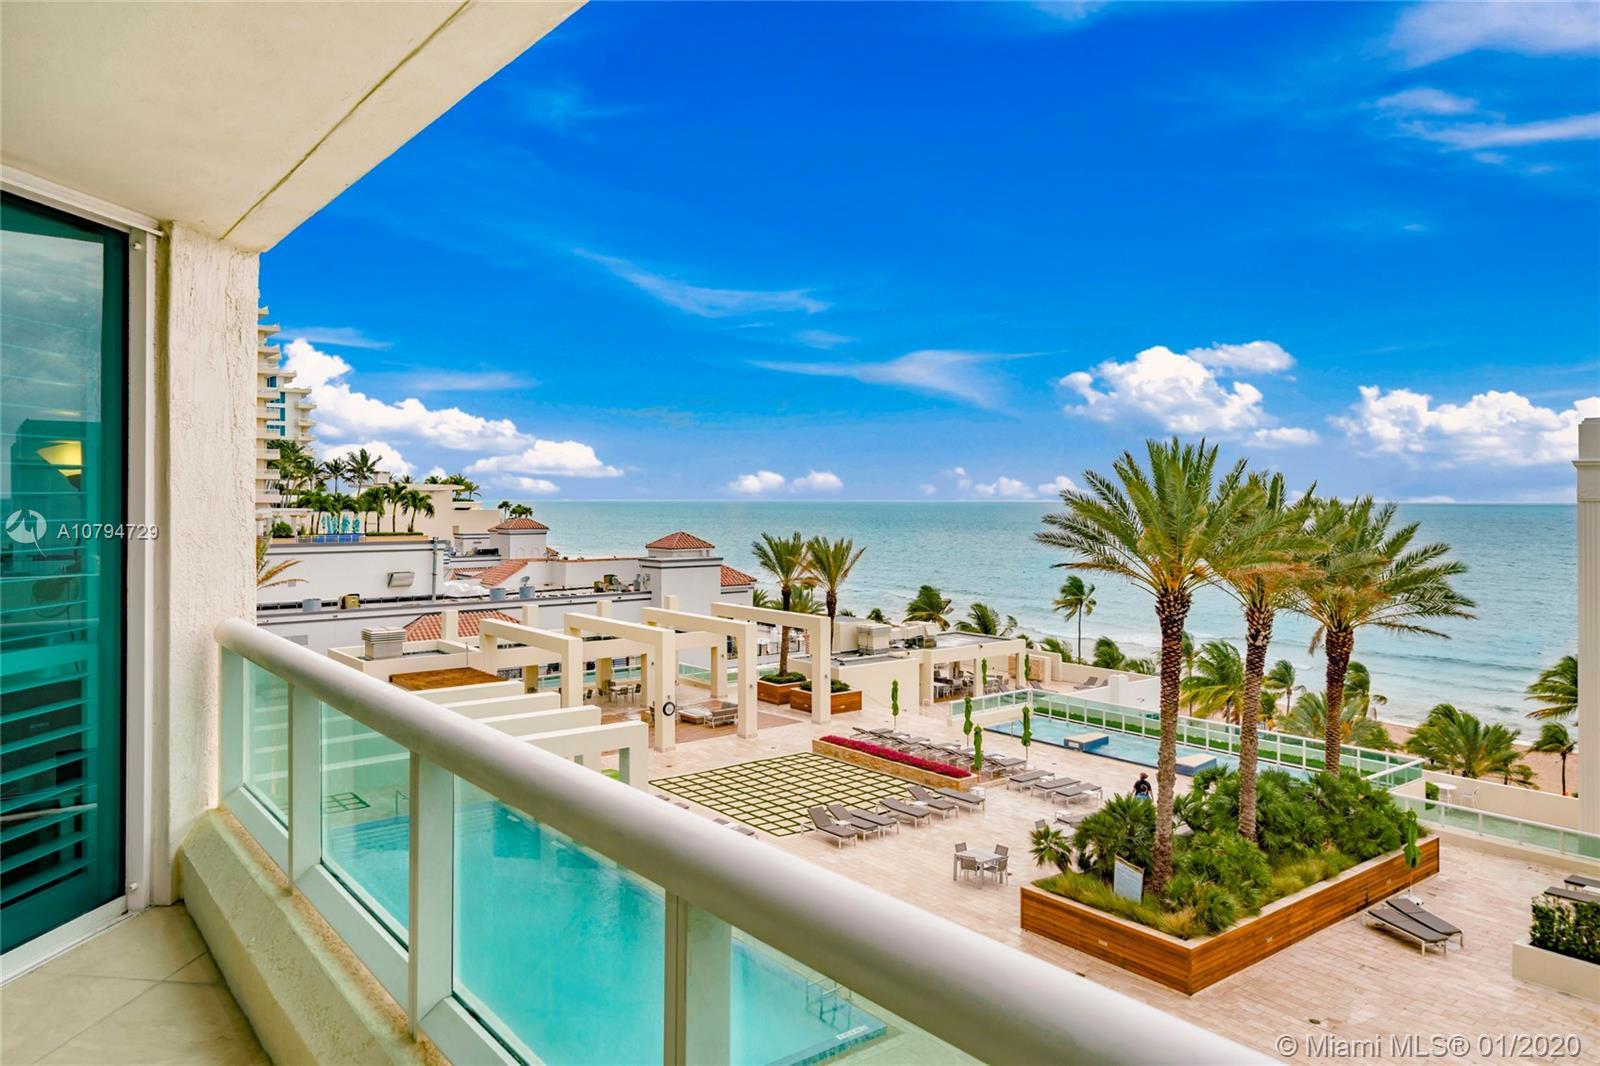 101 S Fort Lauderdale Beach Blvd 901, Fort Lauderdale, FL 33316